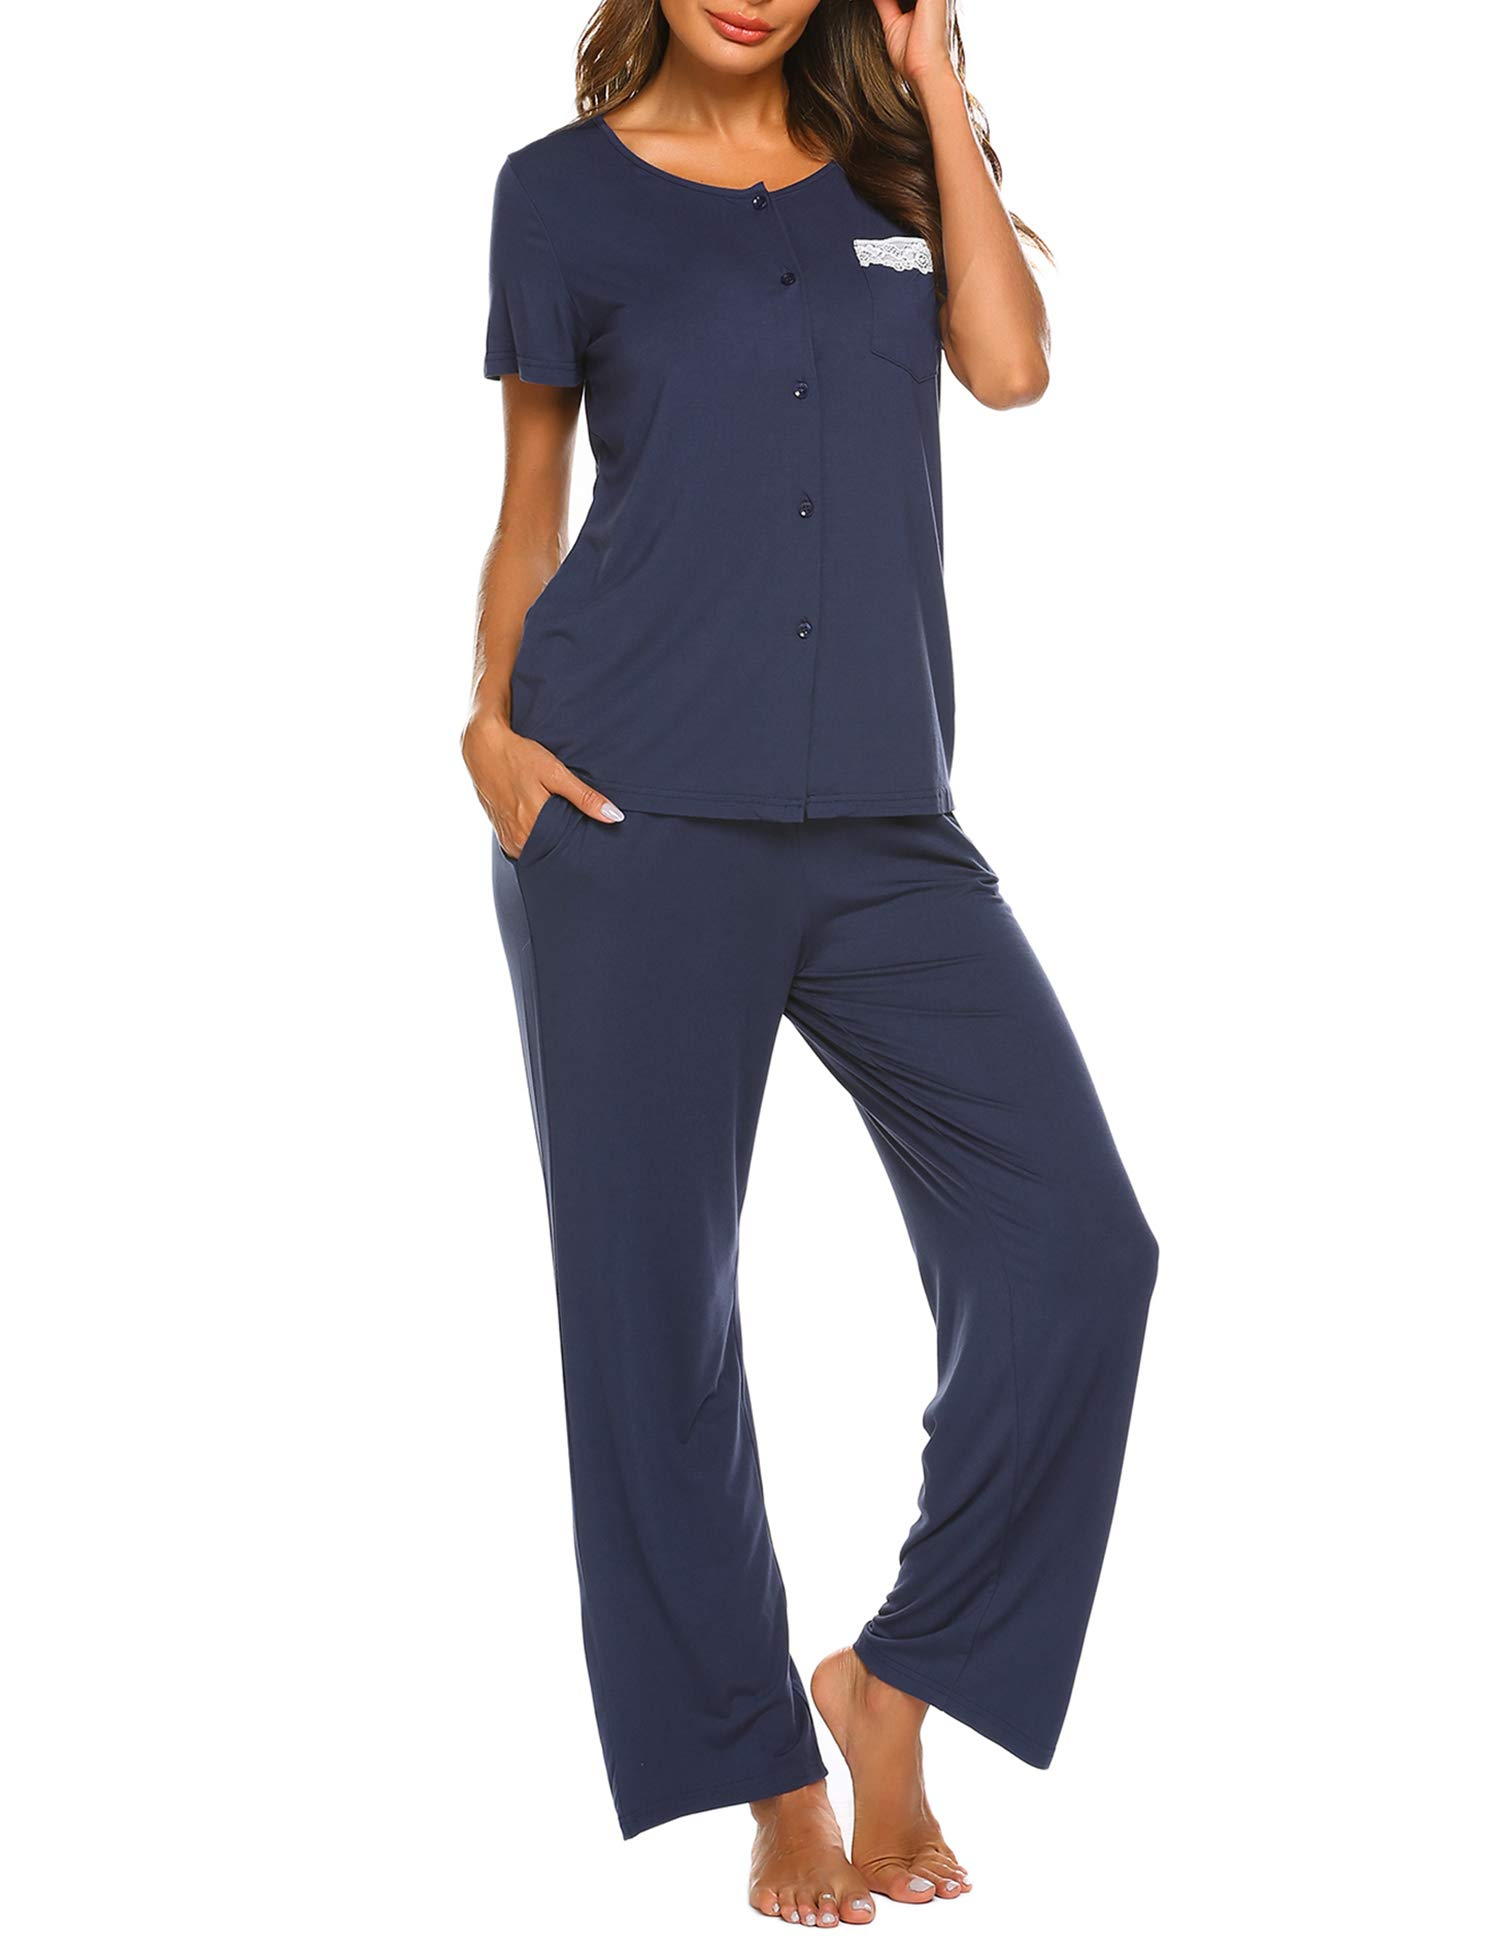 Ekouaer Womens Short Sleeve Button Down Shirt and Long Pajama Pants Sleepwear Set with Pockets (S-XXL)